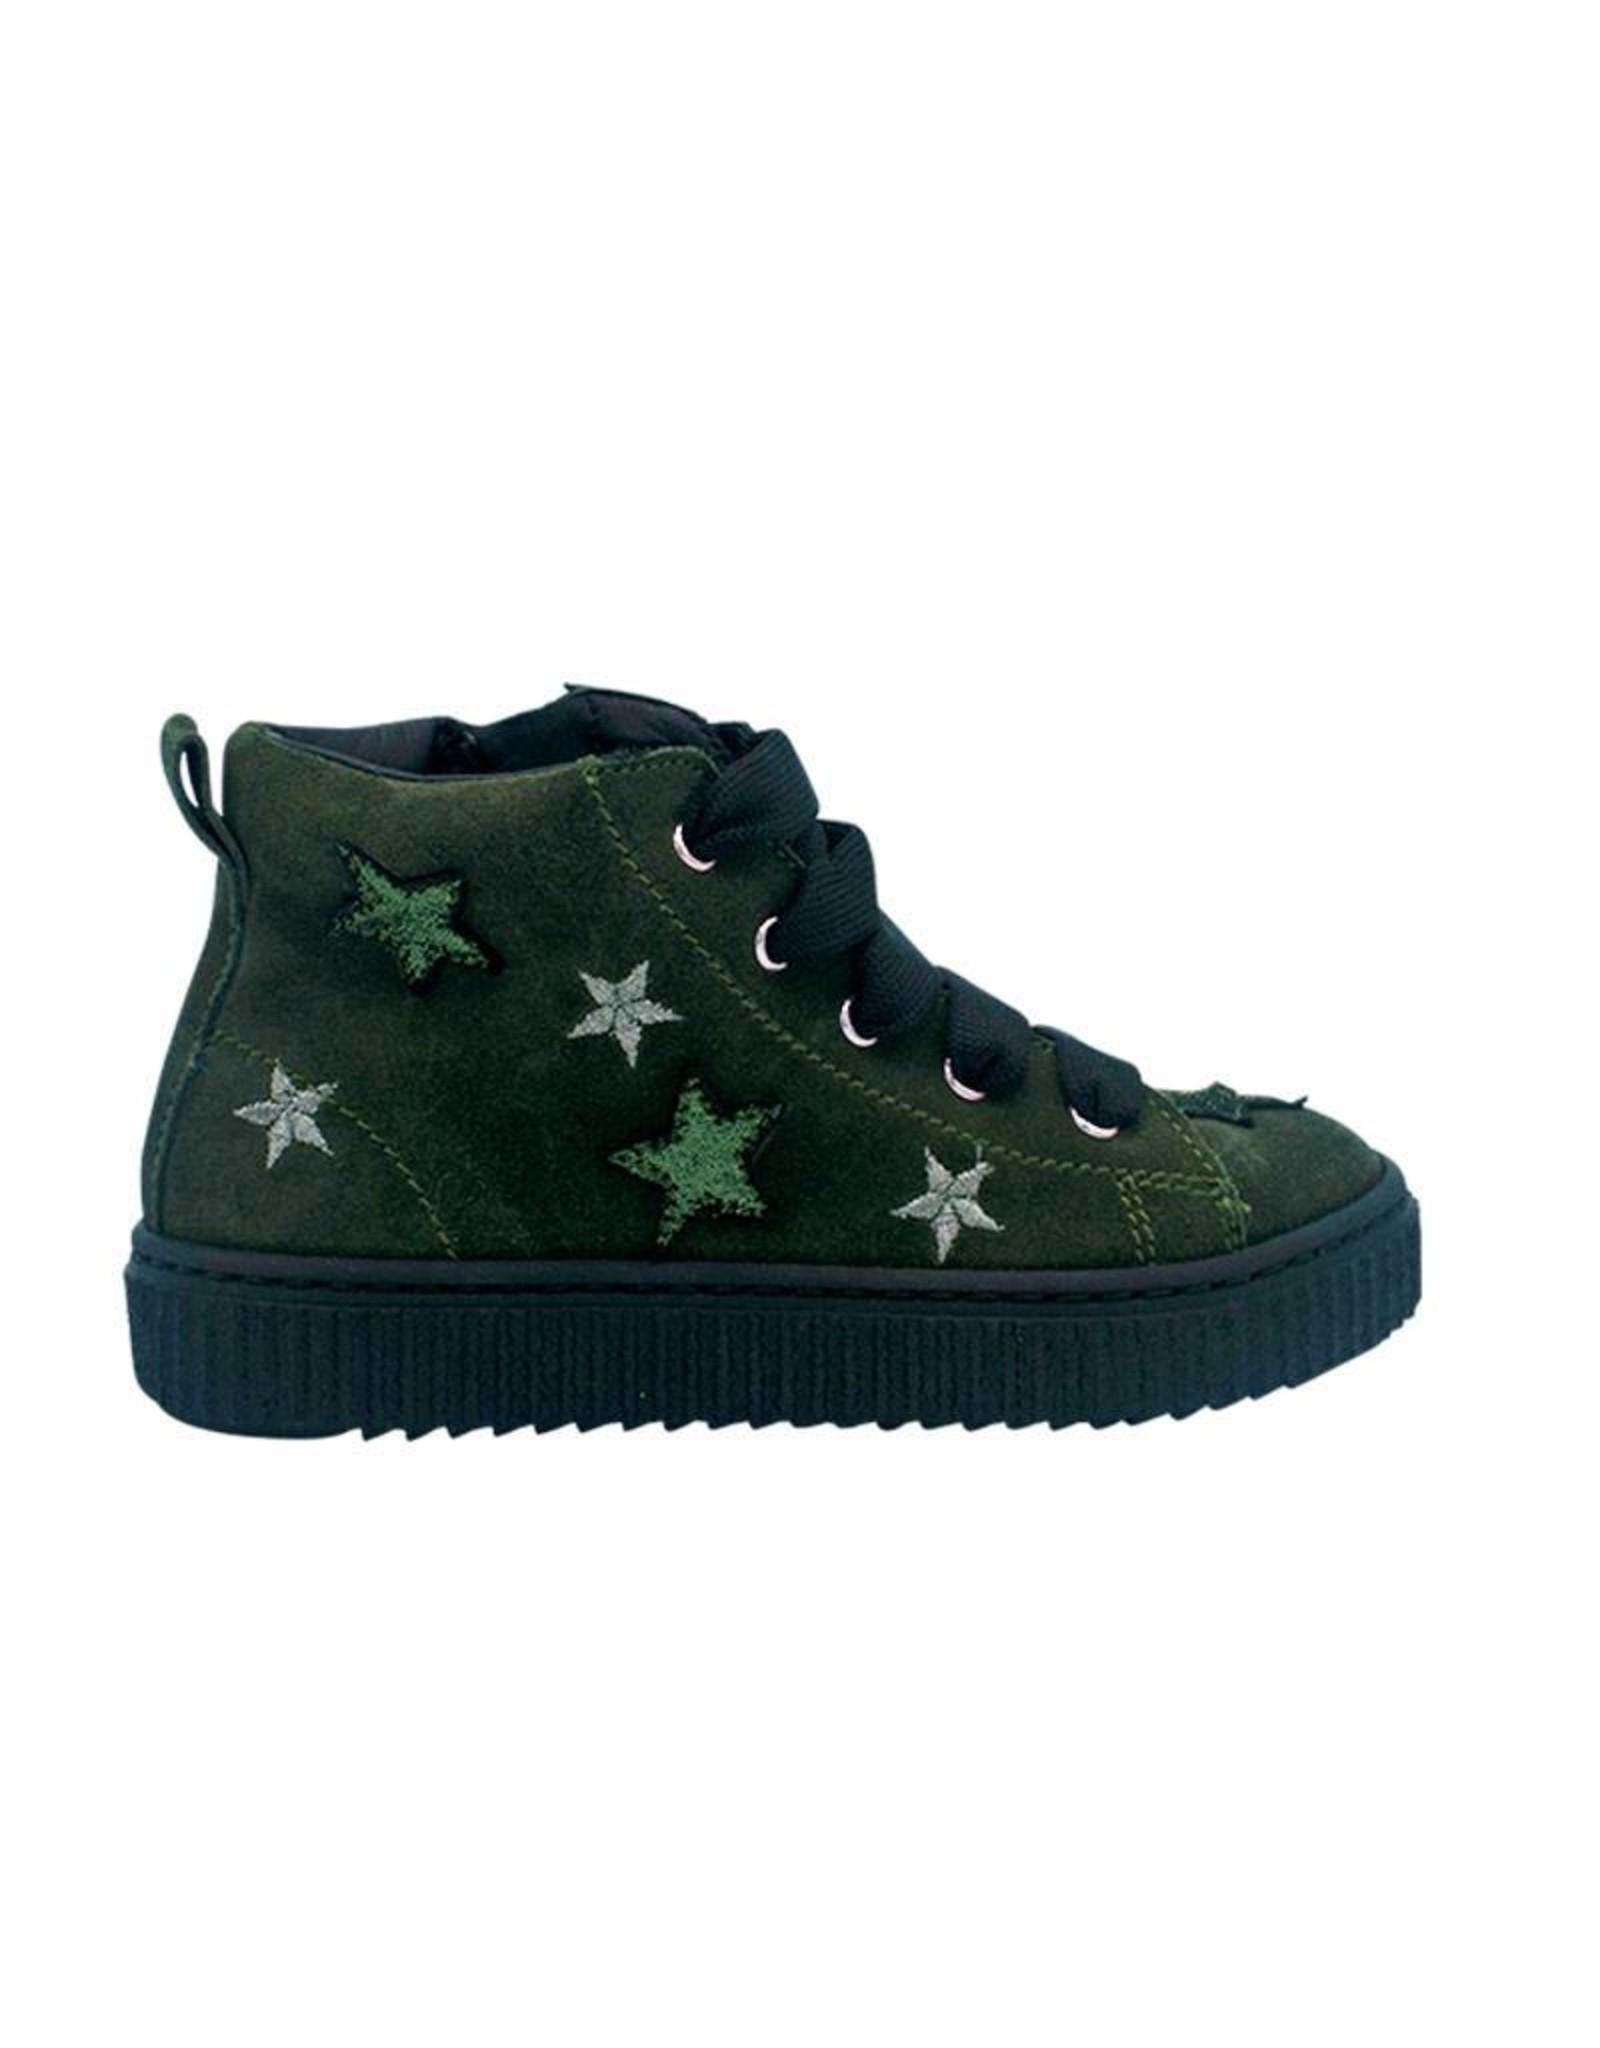 RONDINELLA RONDINELLA sneaker groen sterren